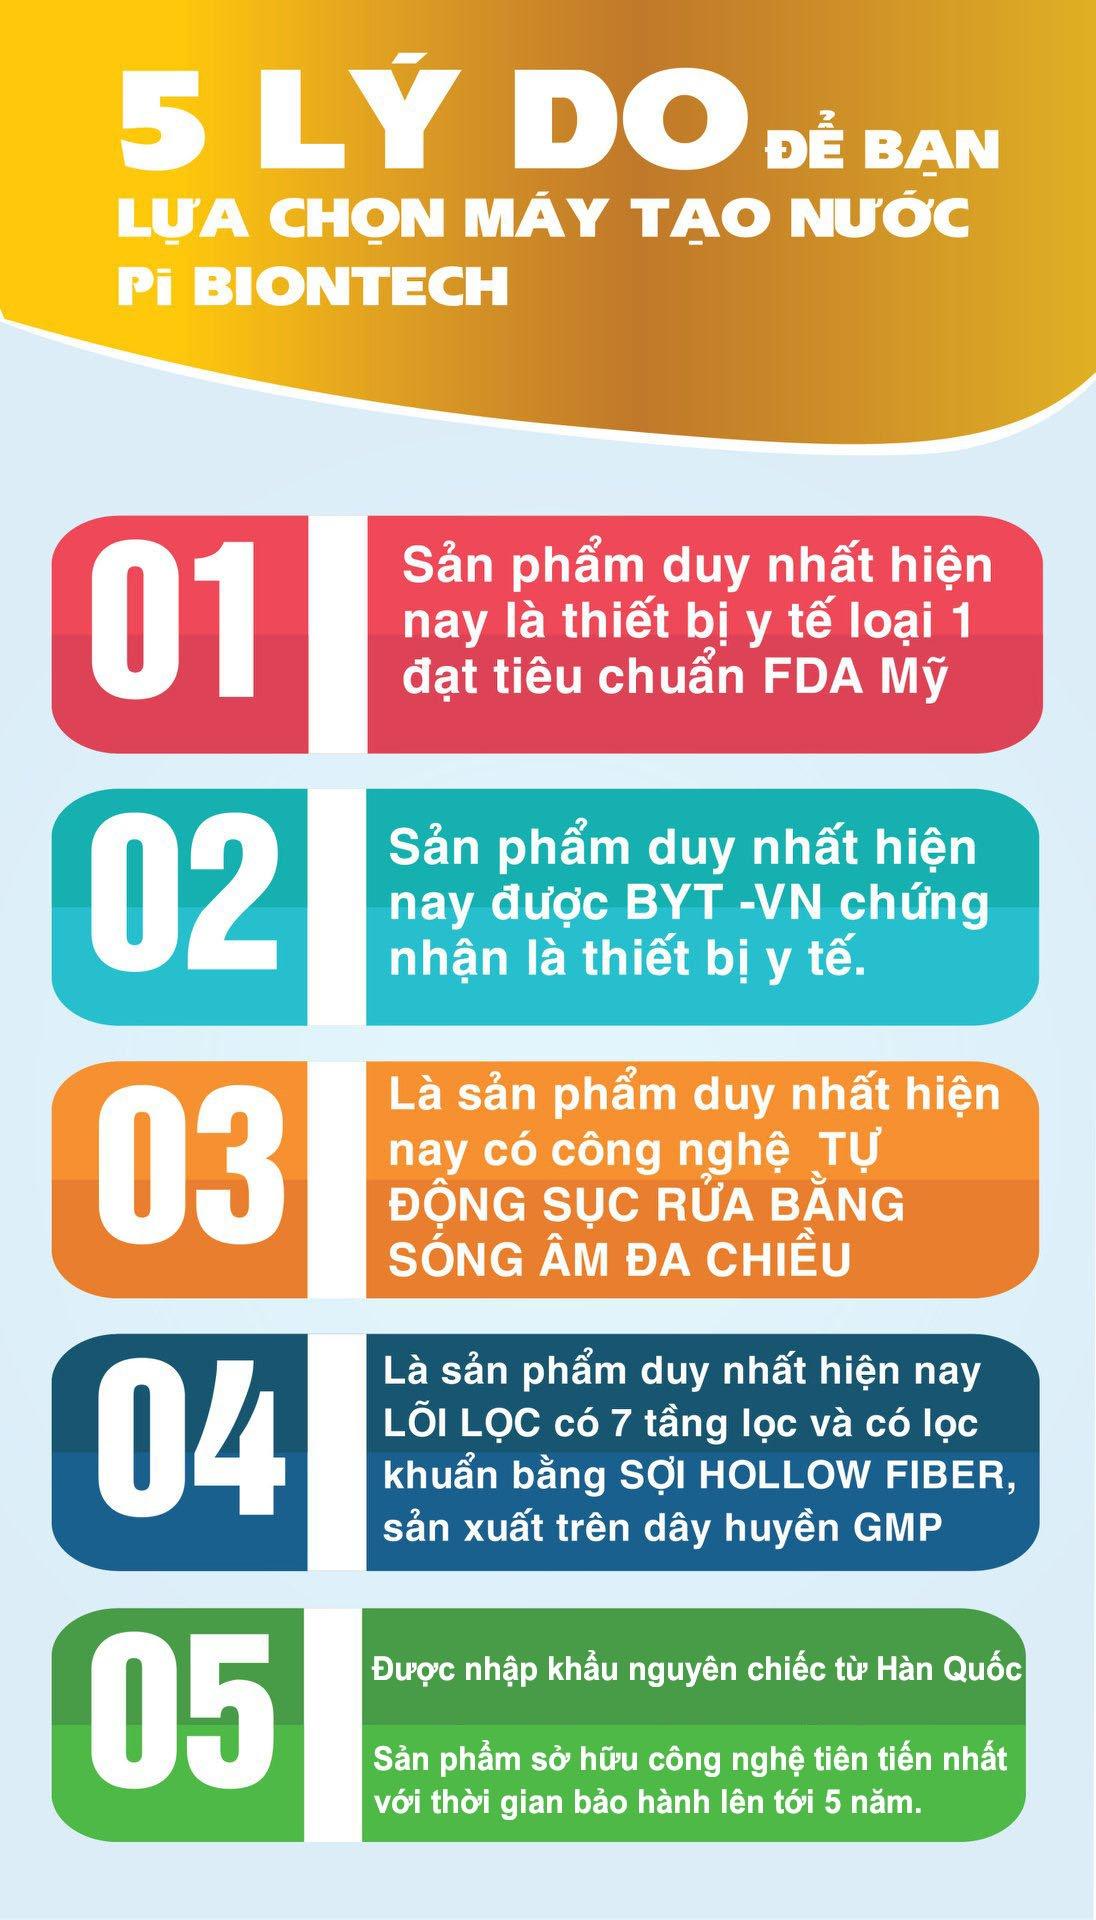 5-ly-do-dac-biet-nen-chon-may-loc-nuoc-pi-biontech